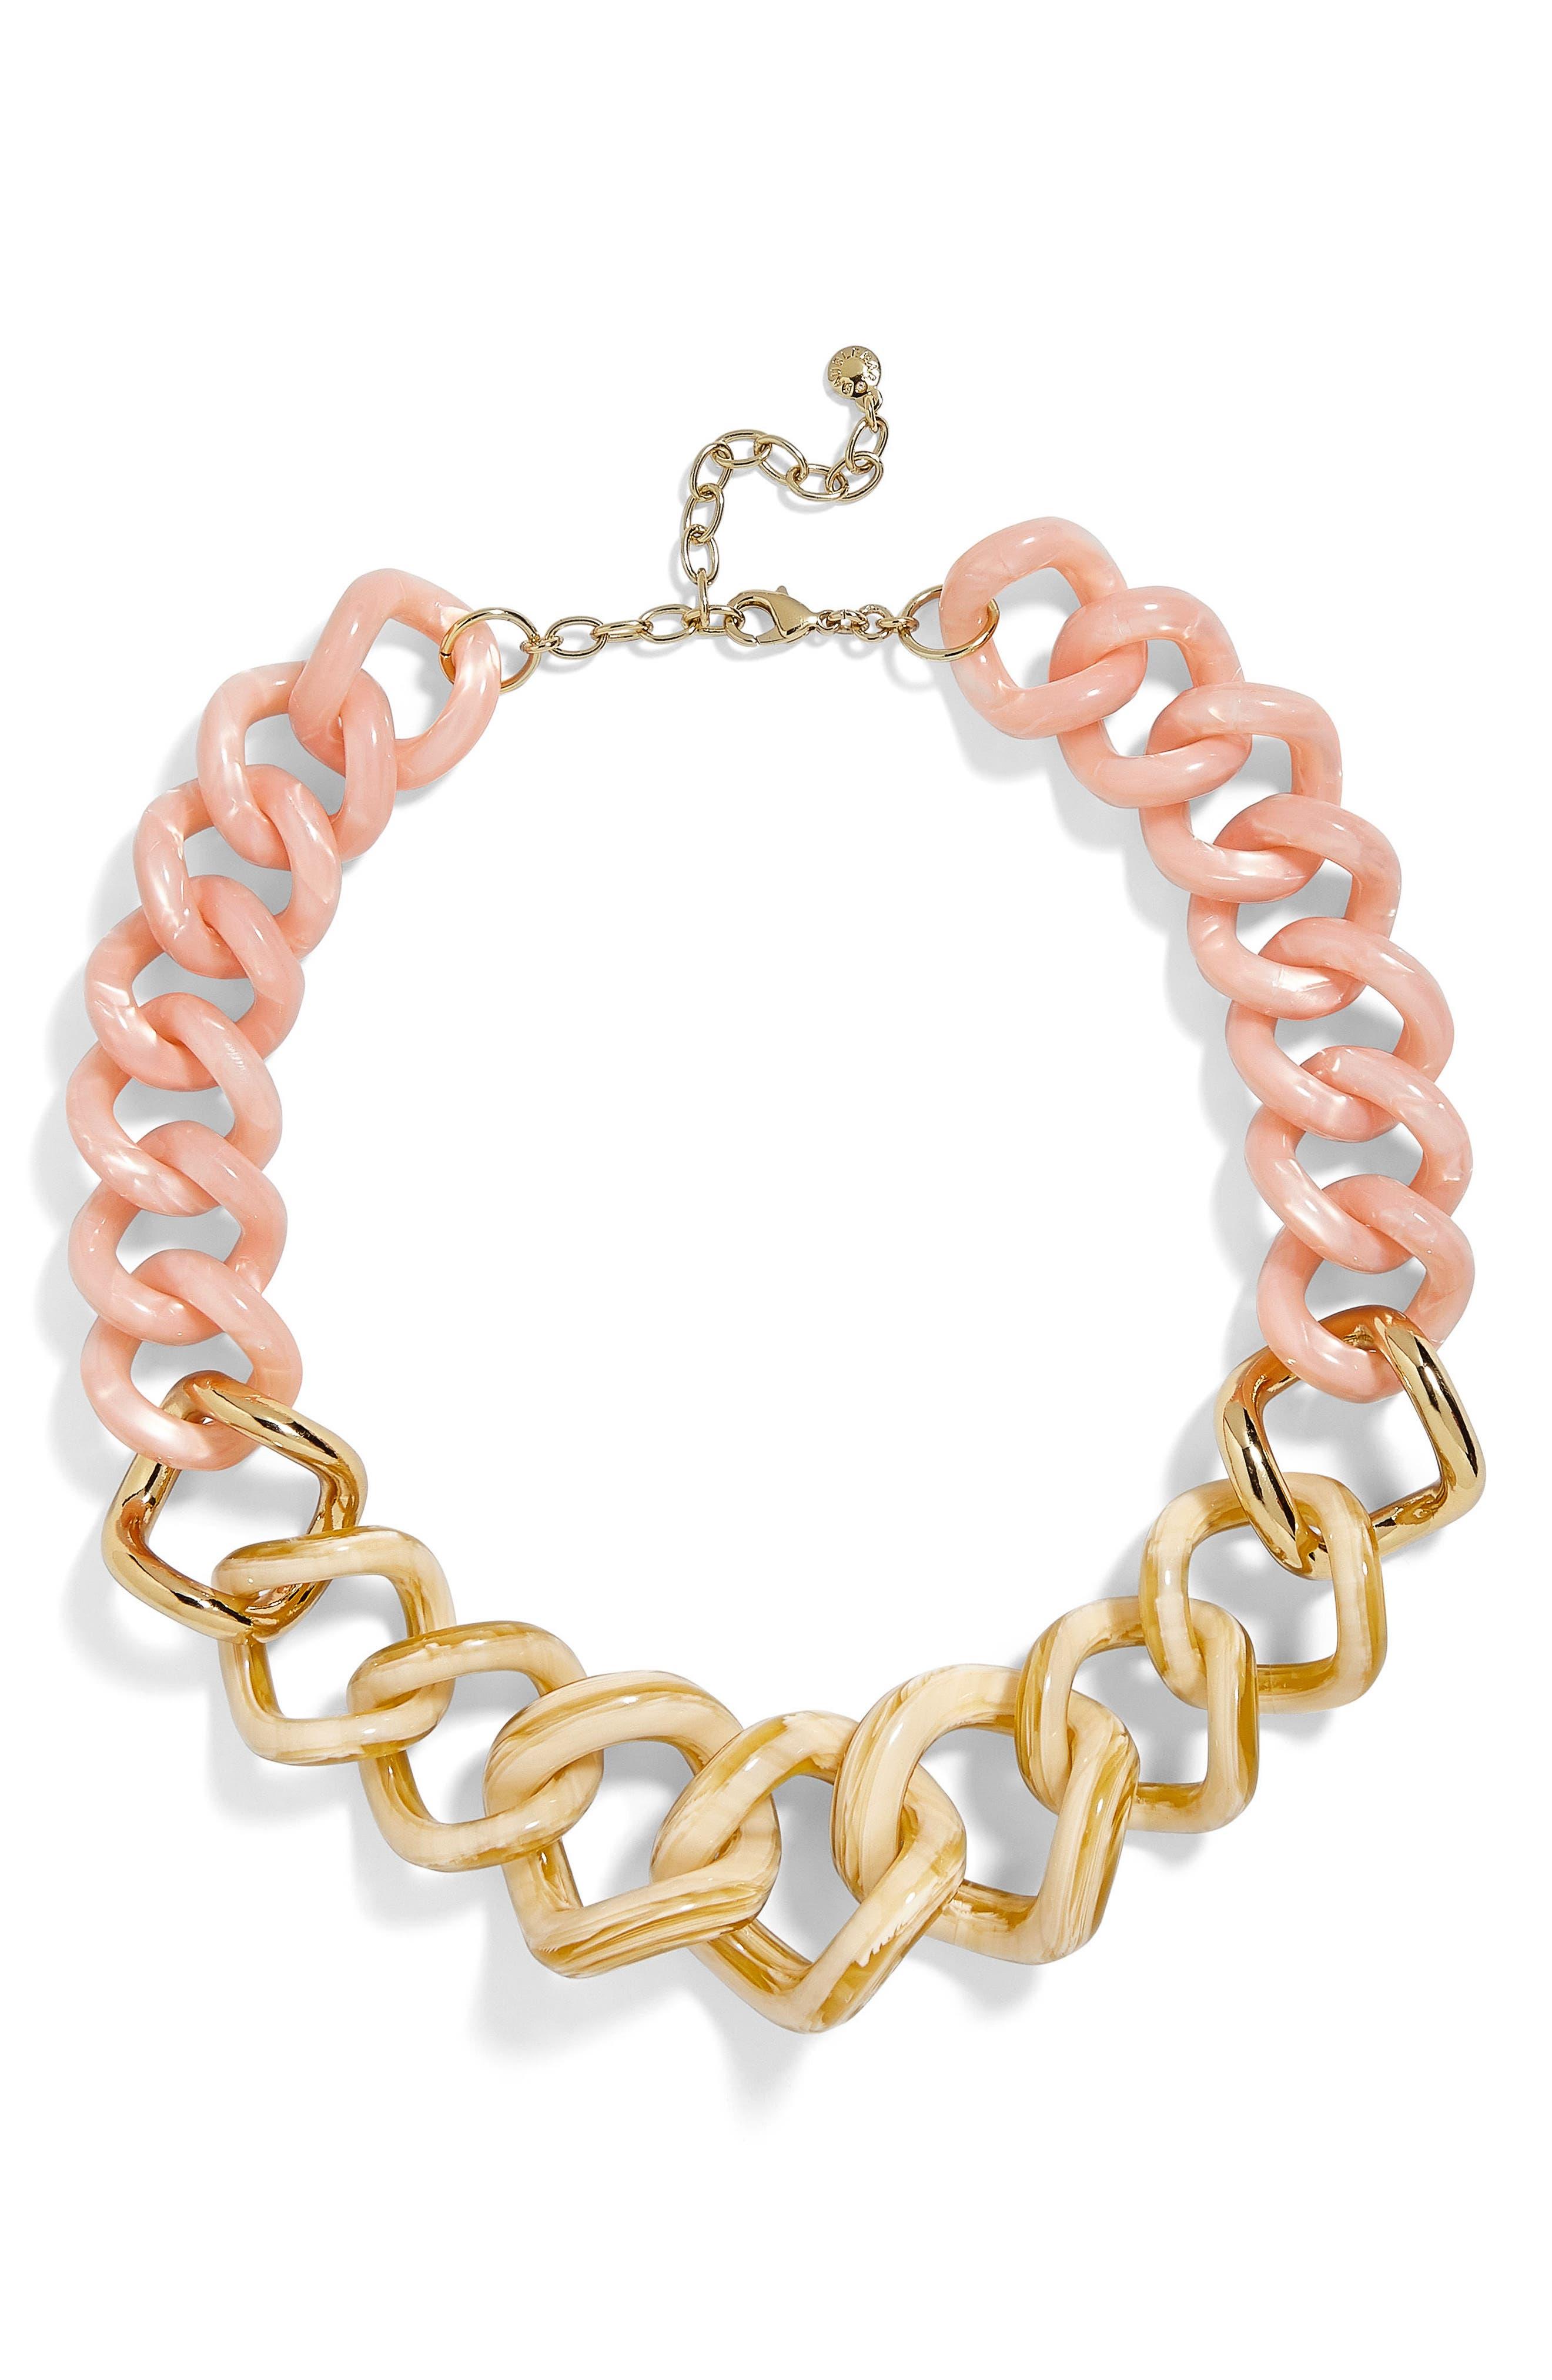 Francina Large Acrylic Link Necklace,                             Main thumbnail 1, color,                             Blush